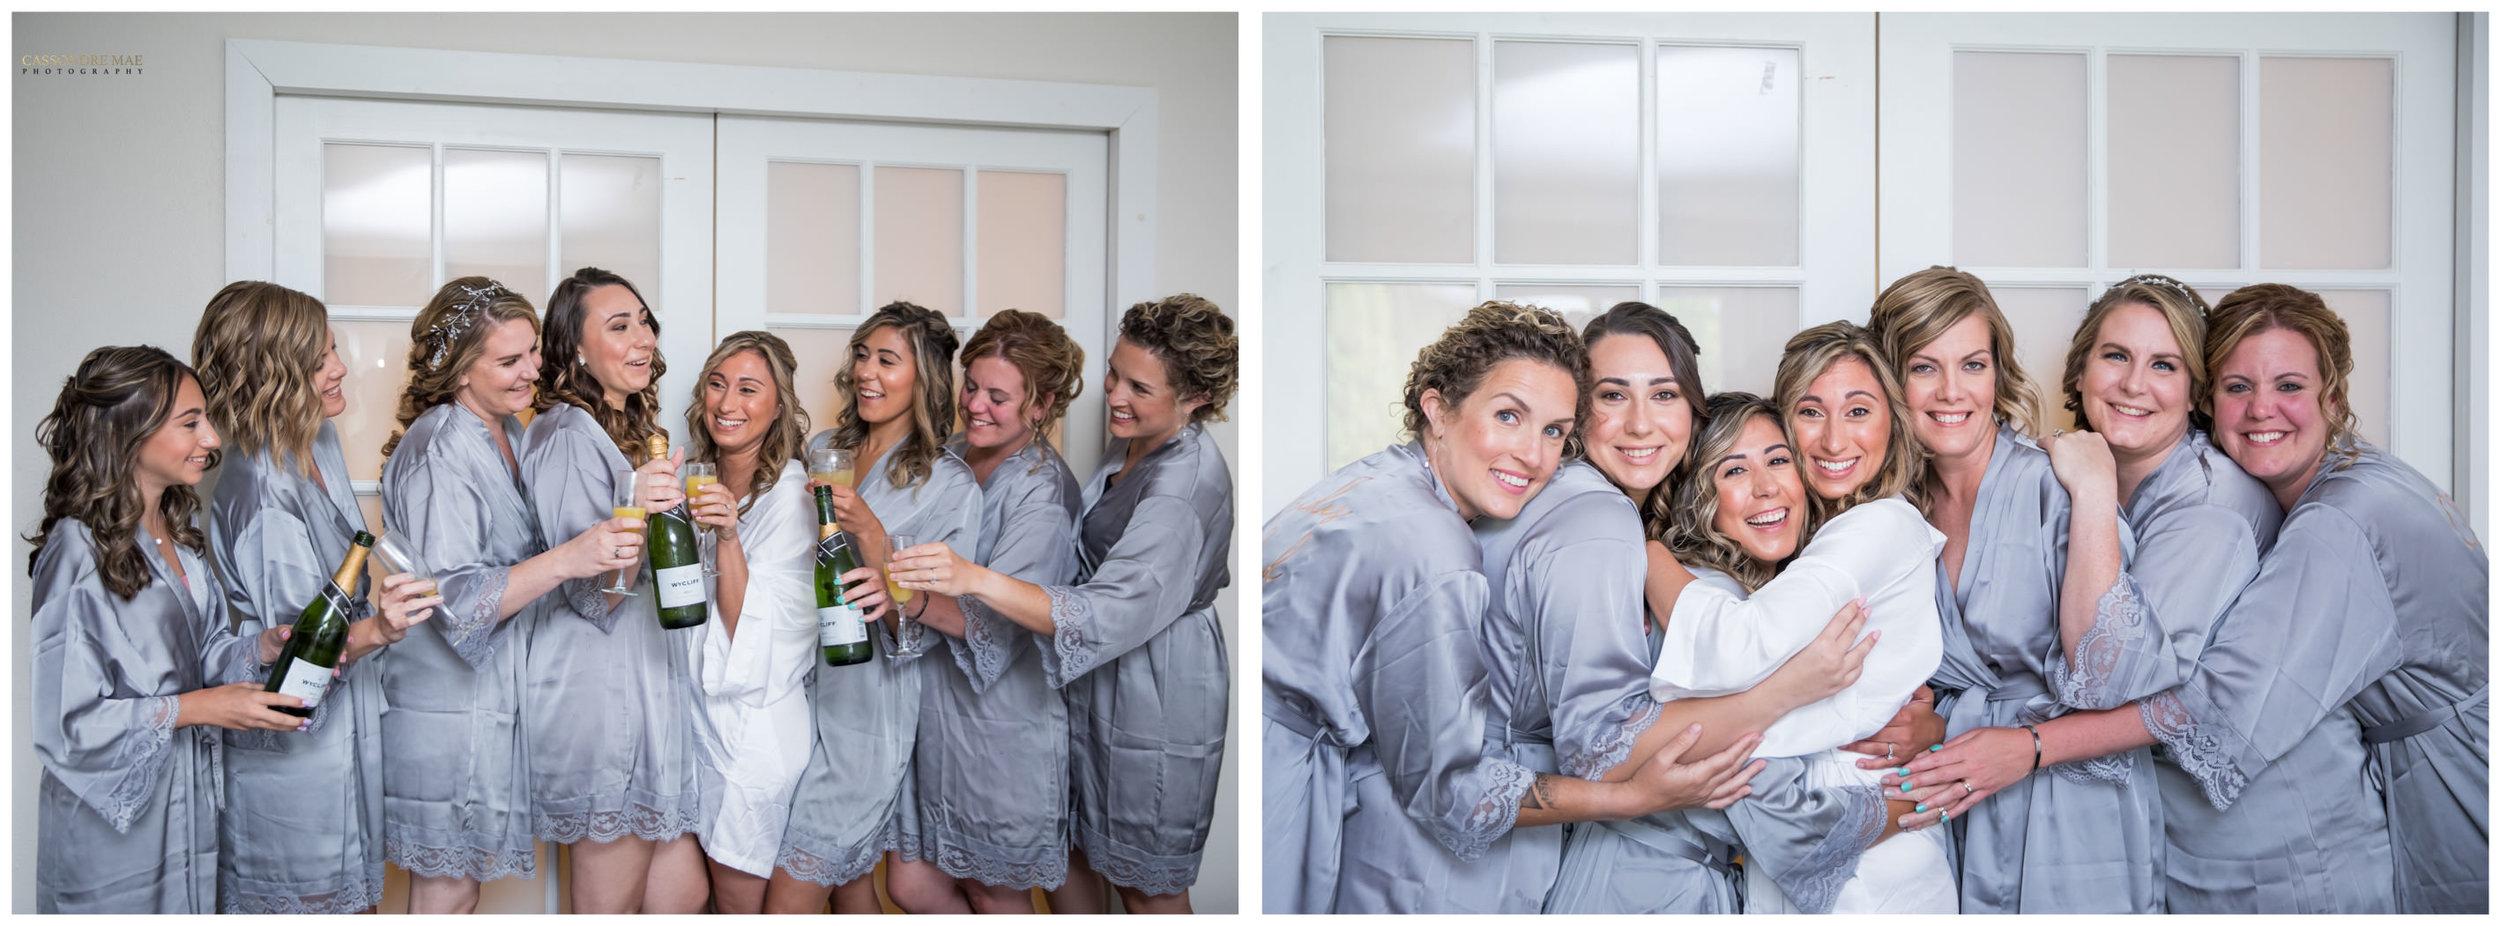 Cassondre Mae Photography Hudson Valley Wedding 5.jpg